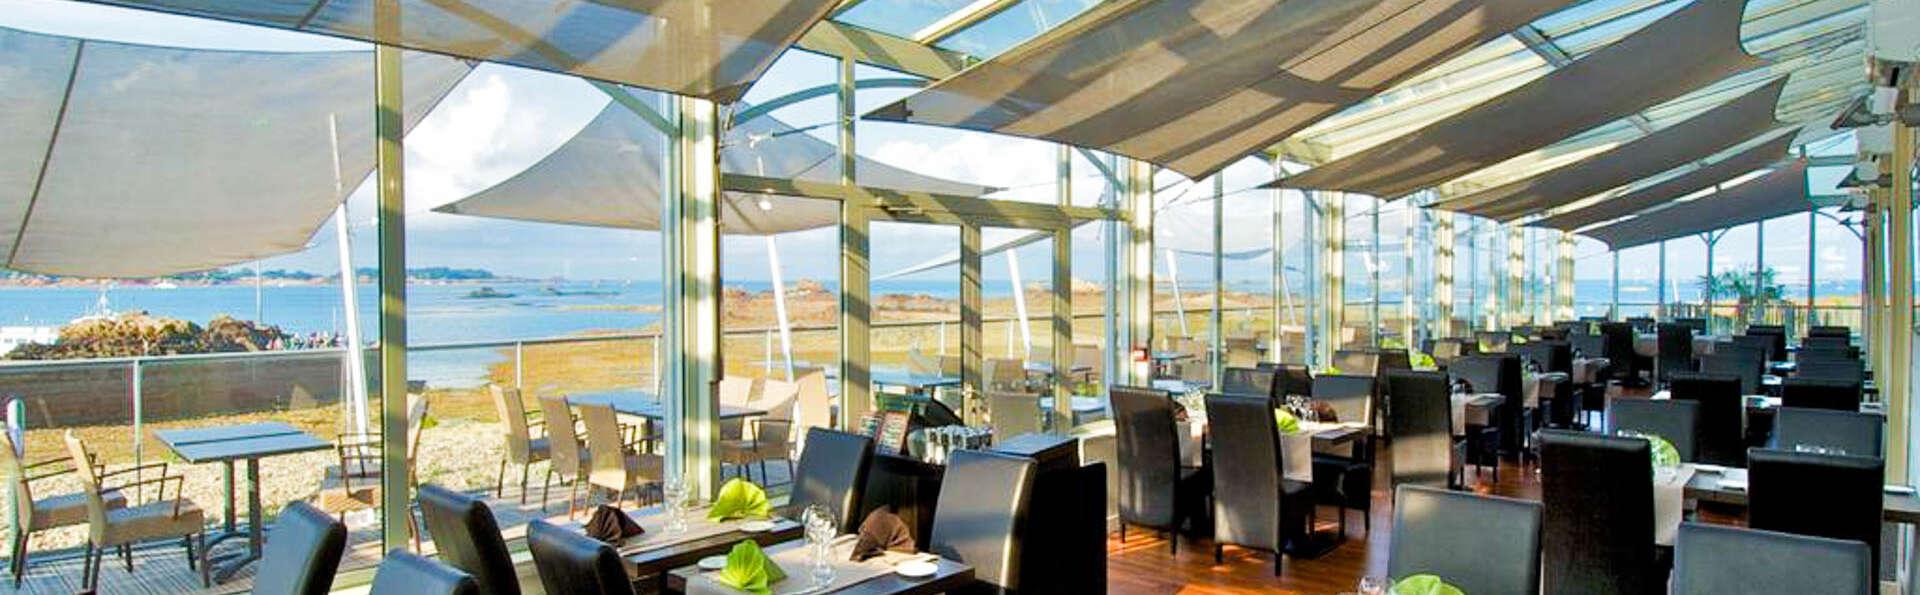 Best Western Les Terrasses de Brehat  - EDIT_RESTAURANT.jpg